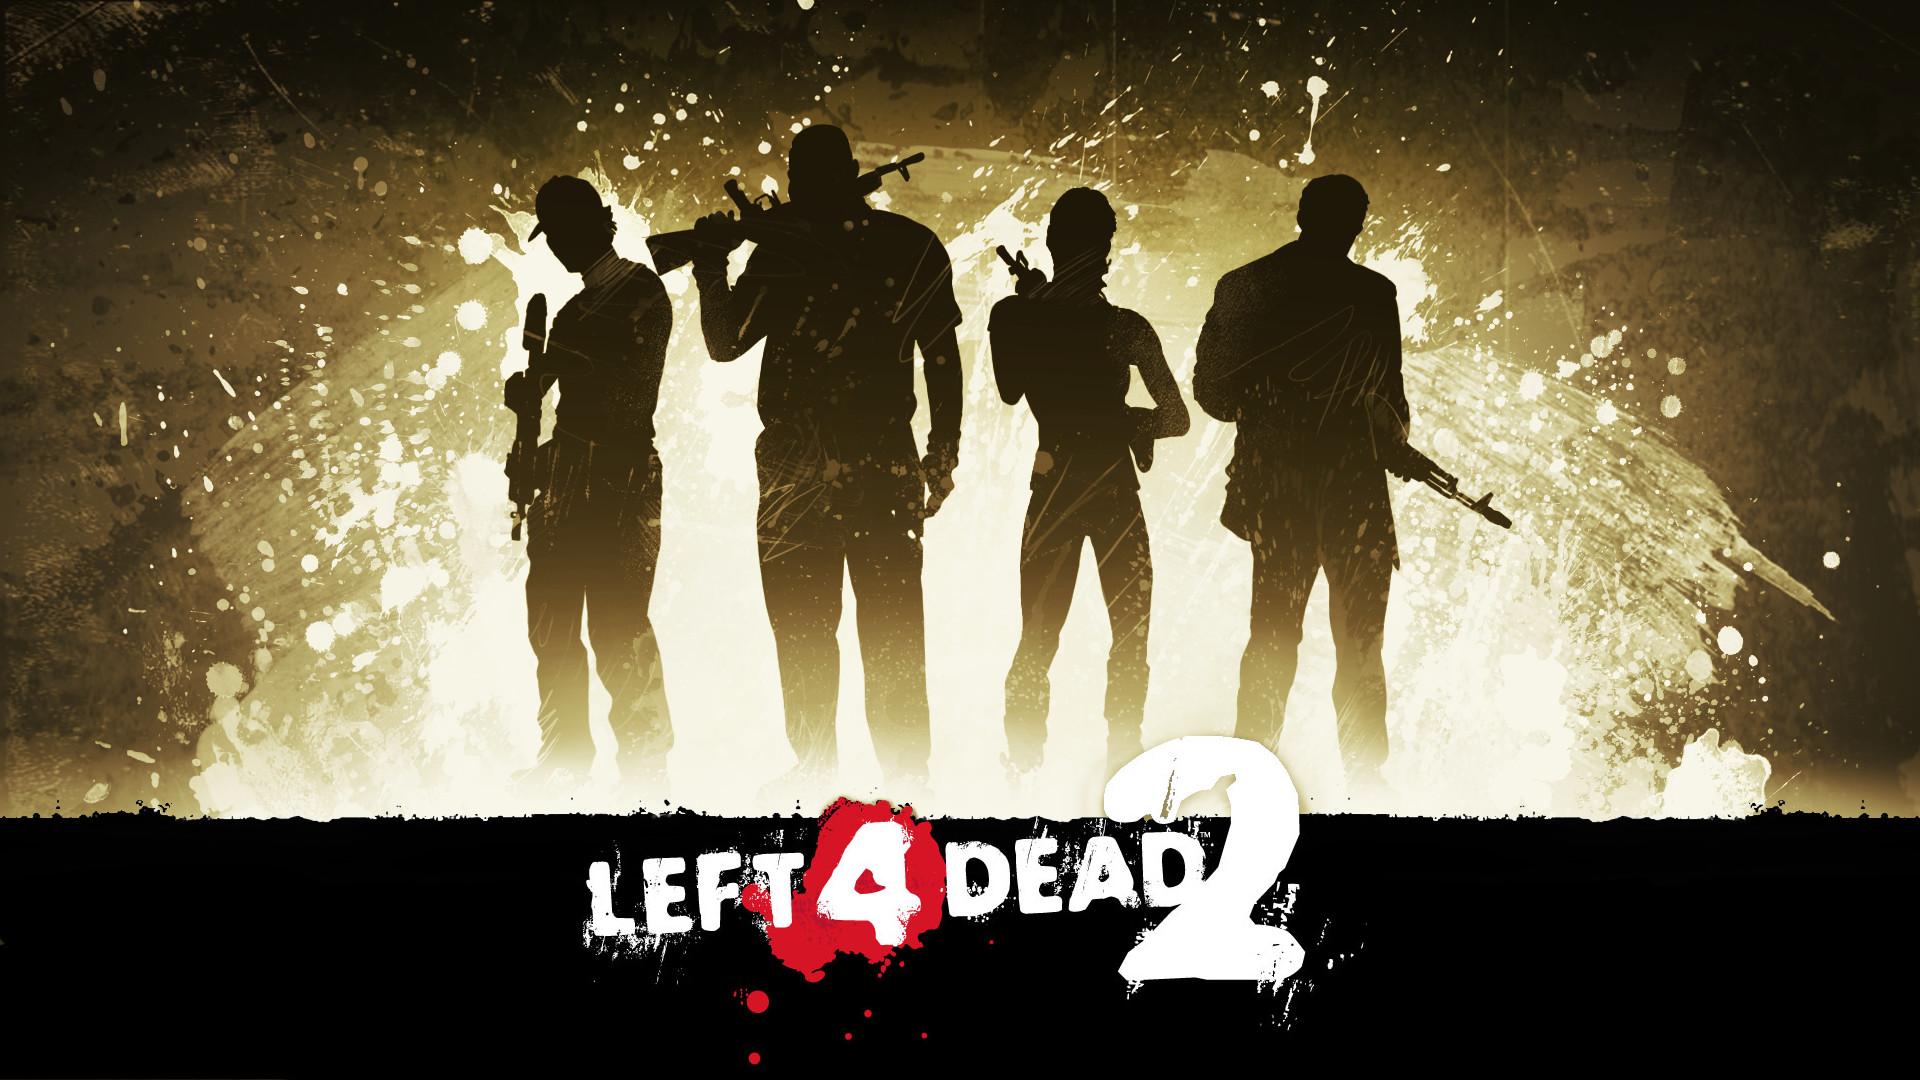 Left 4 Dead Wallpaper (72+ images)